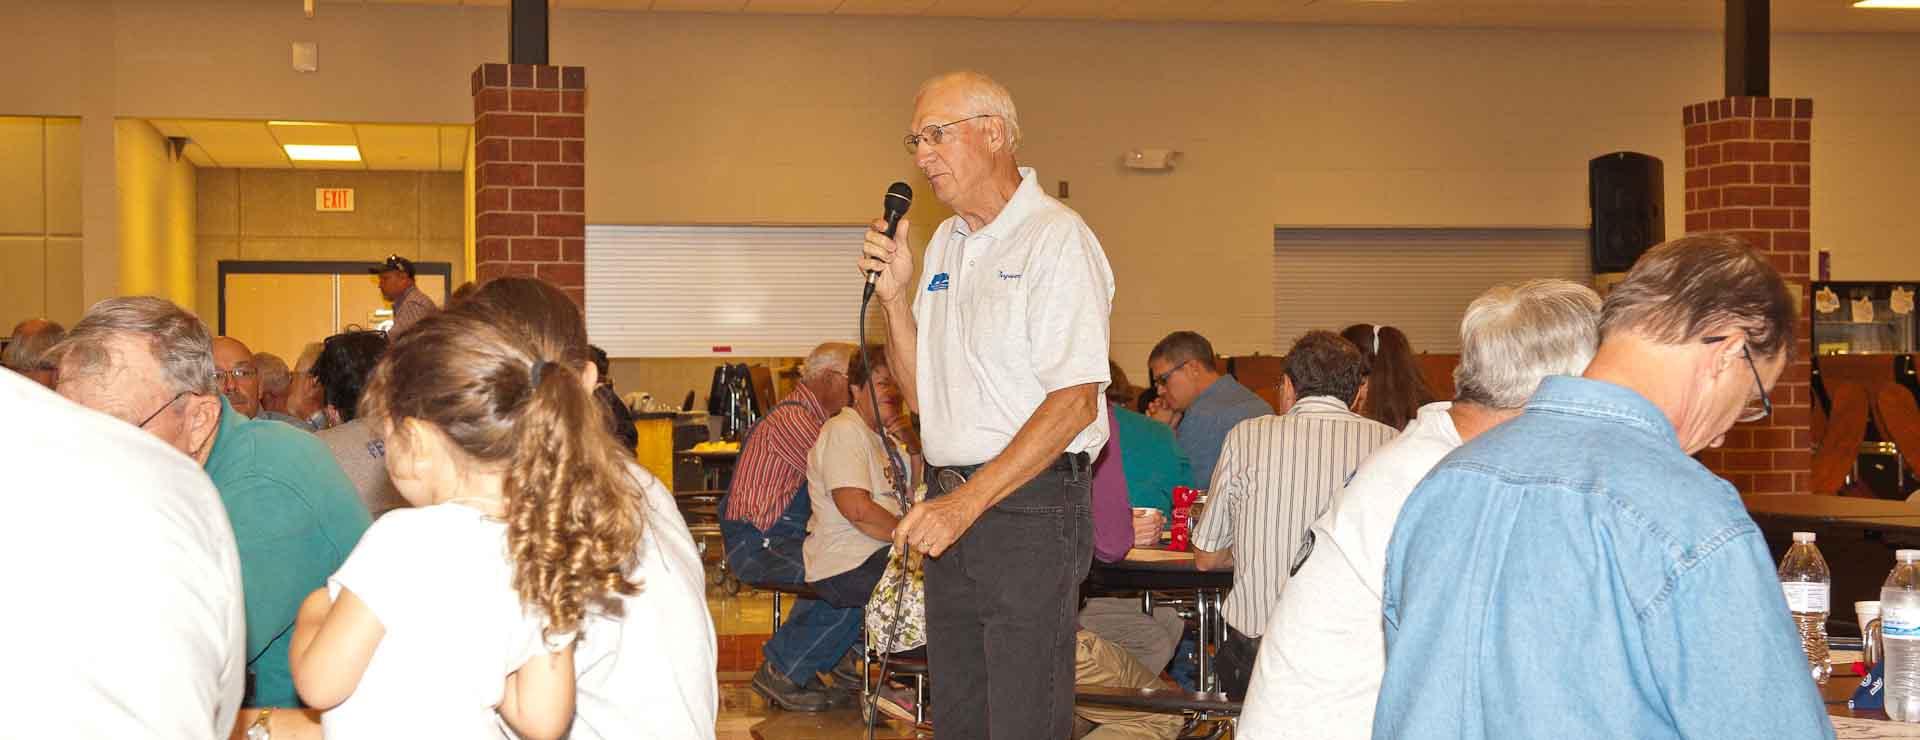 2016 FENA President, Max Miner speaking to dinner attendees.